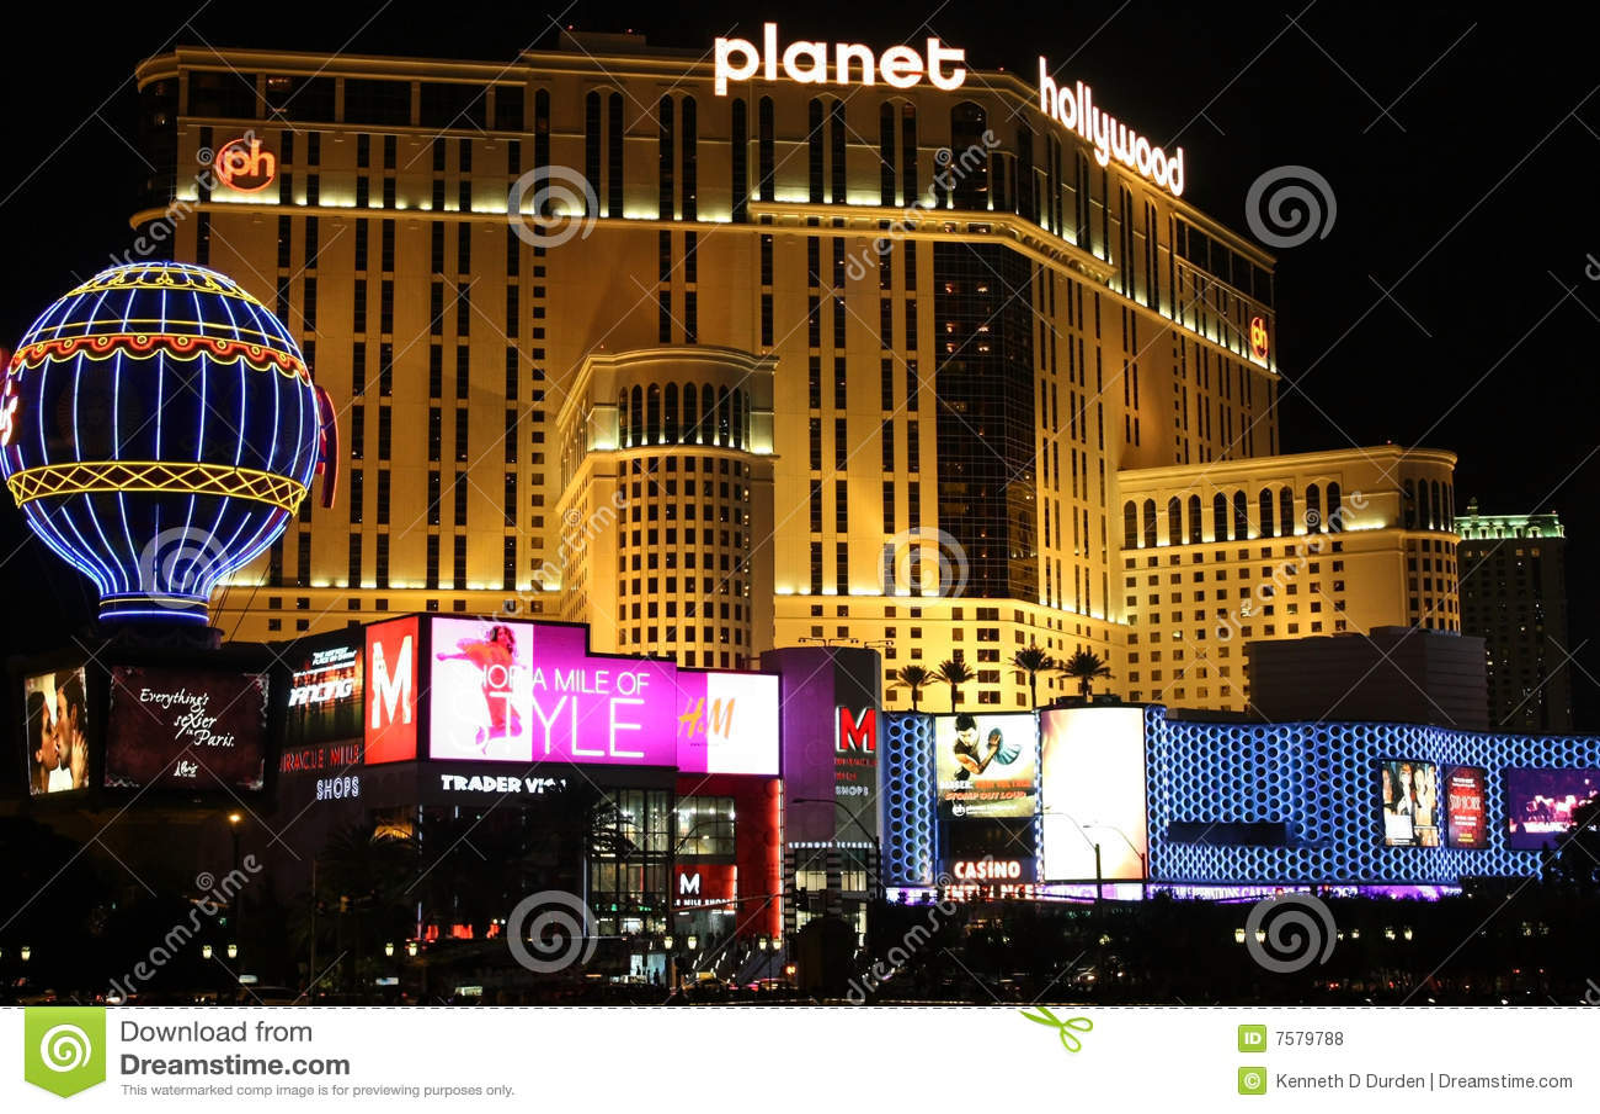 Planet hollwood casino las vegas hard rock casino boat